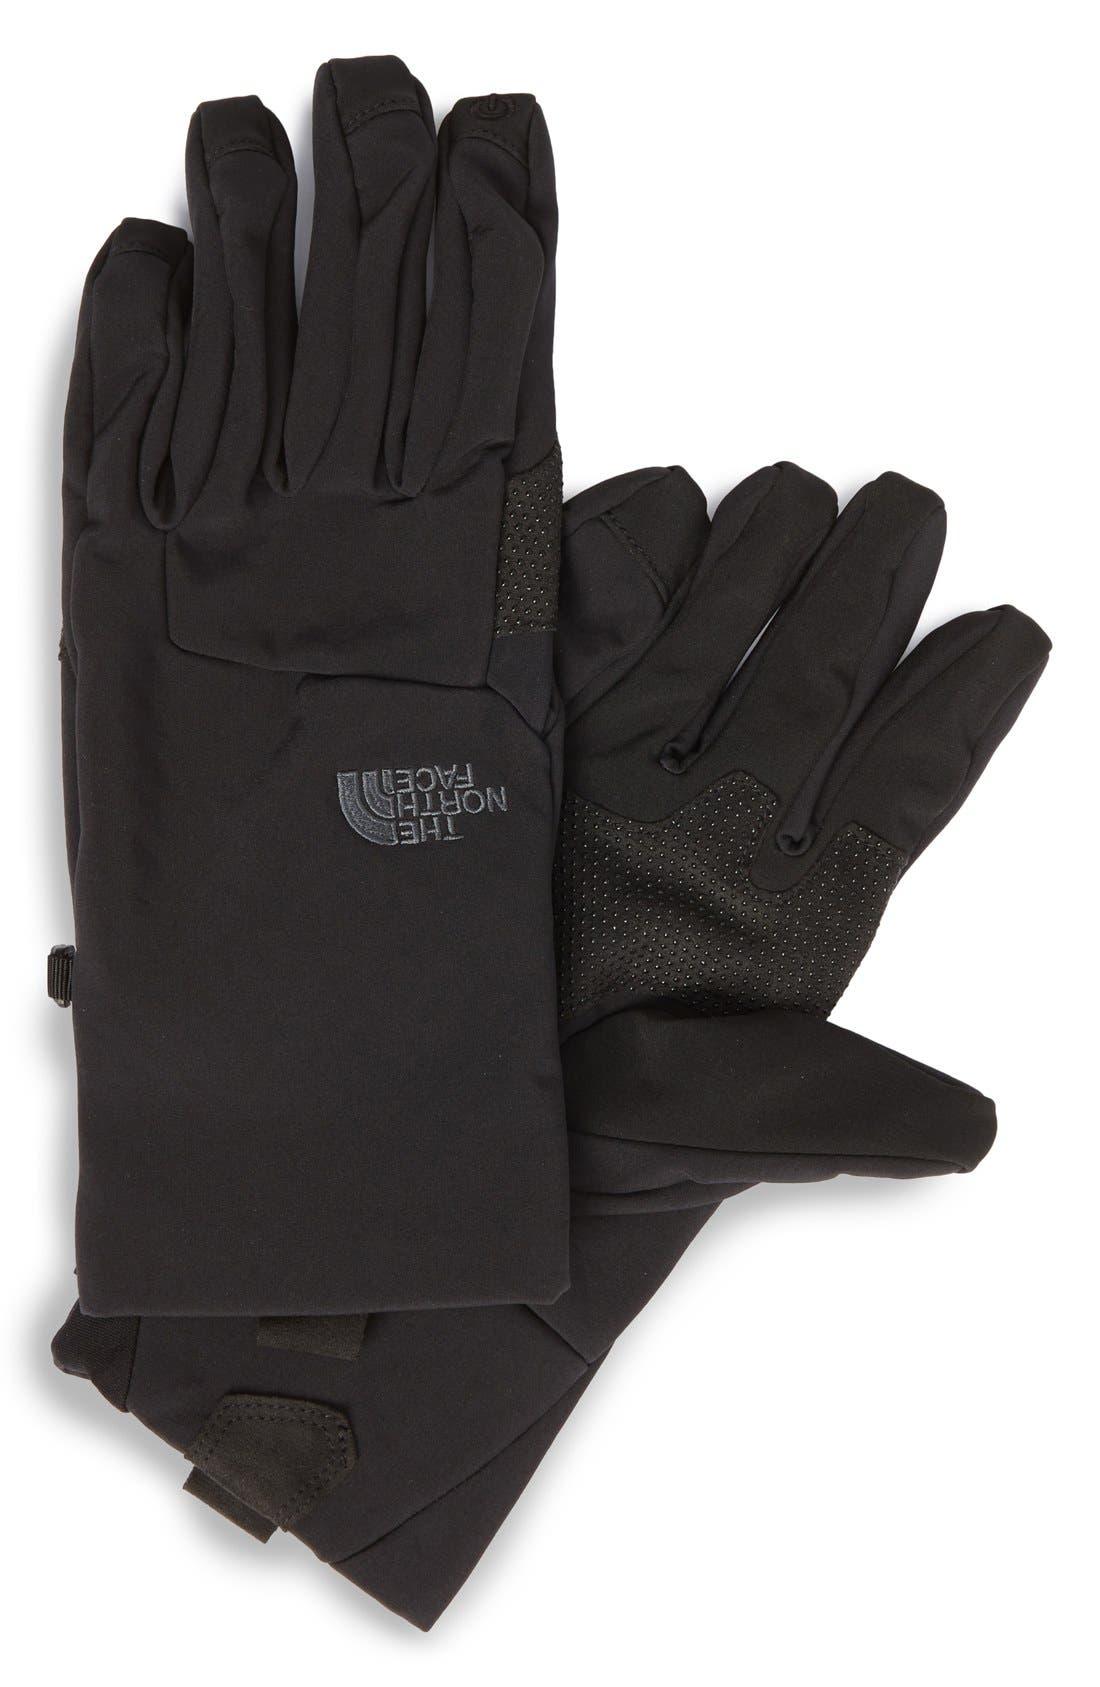 Alternate Image 1 Selected - The North Face eTip Apex ClimateBlock Gloves